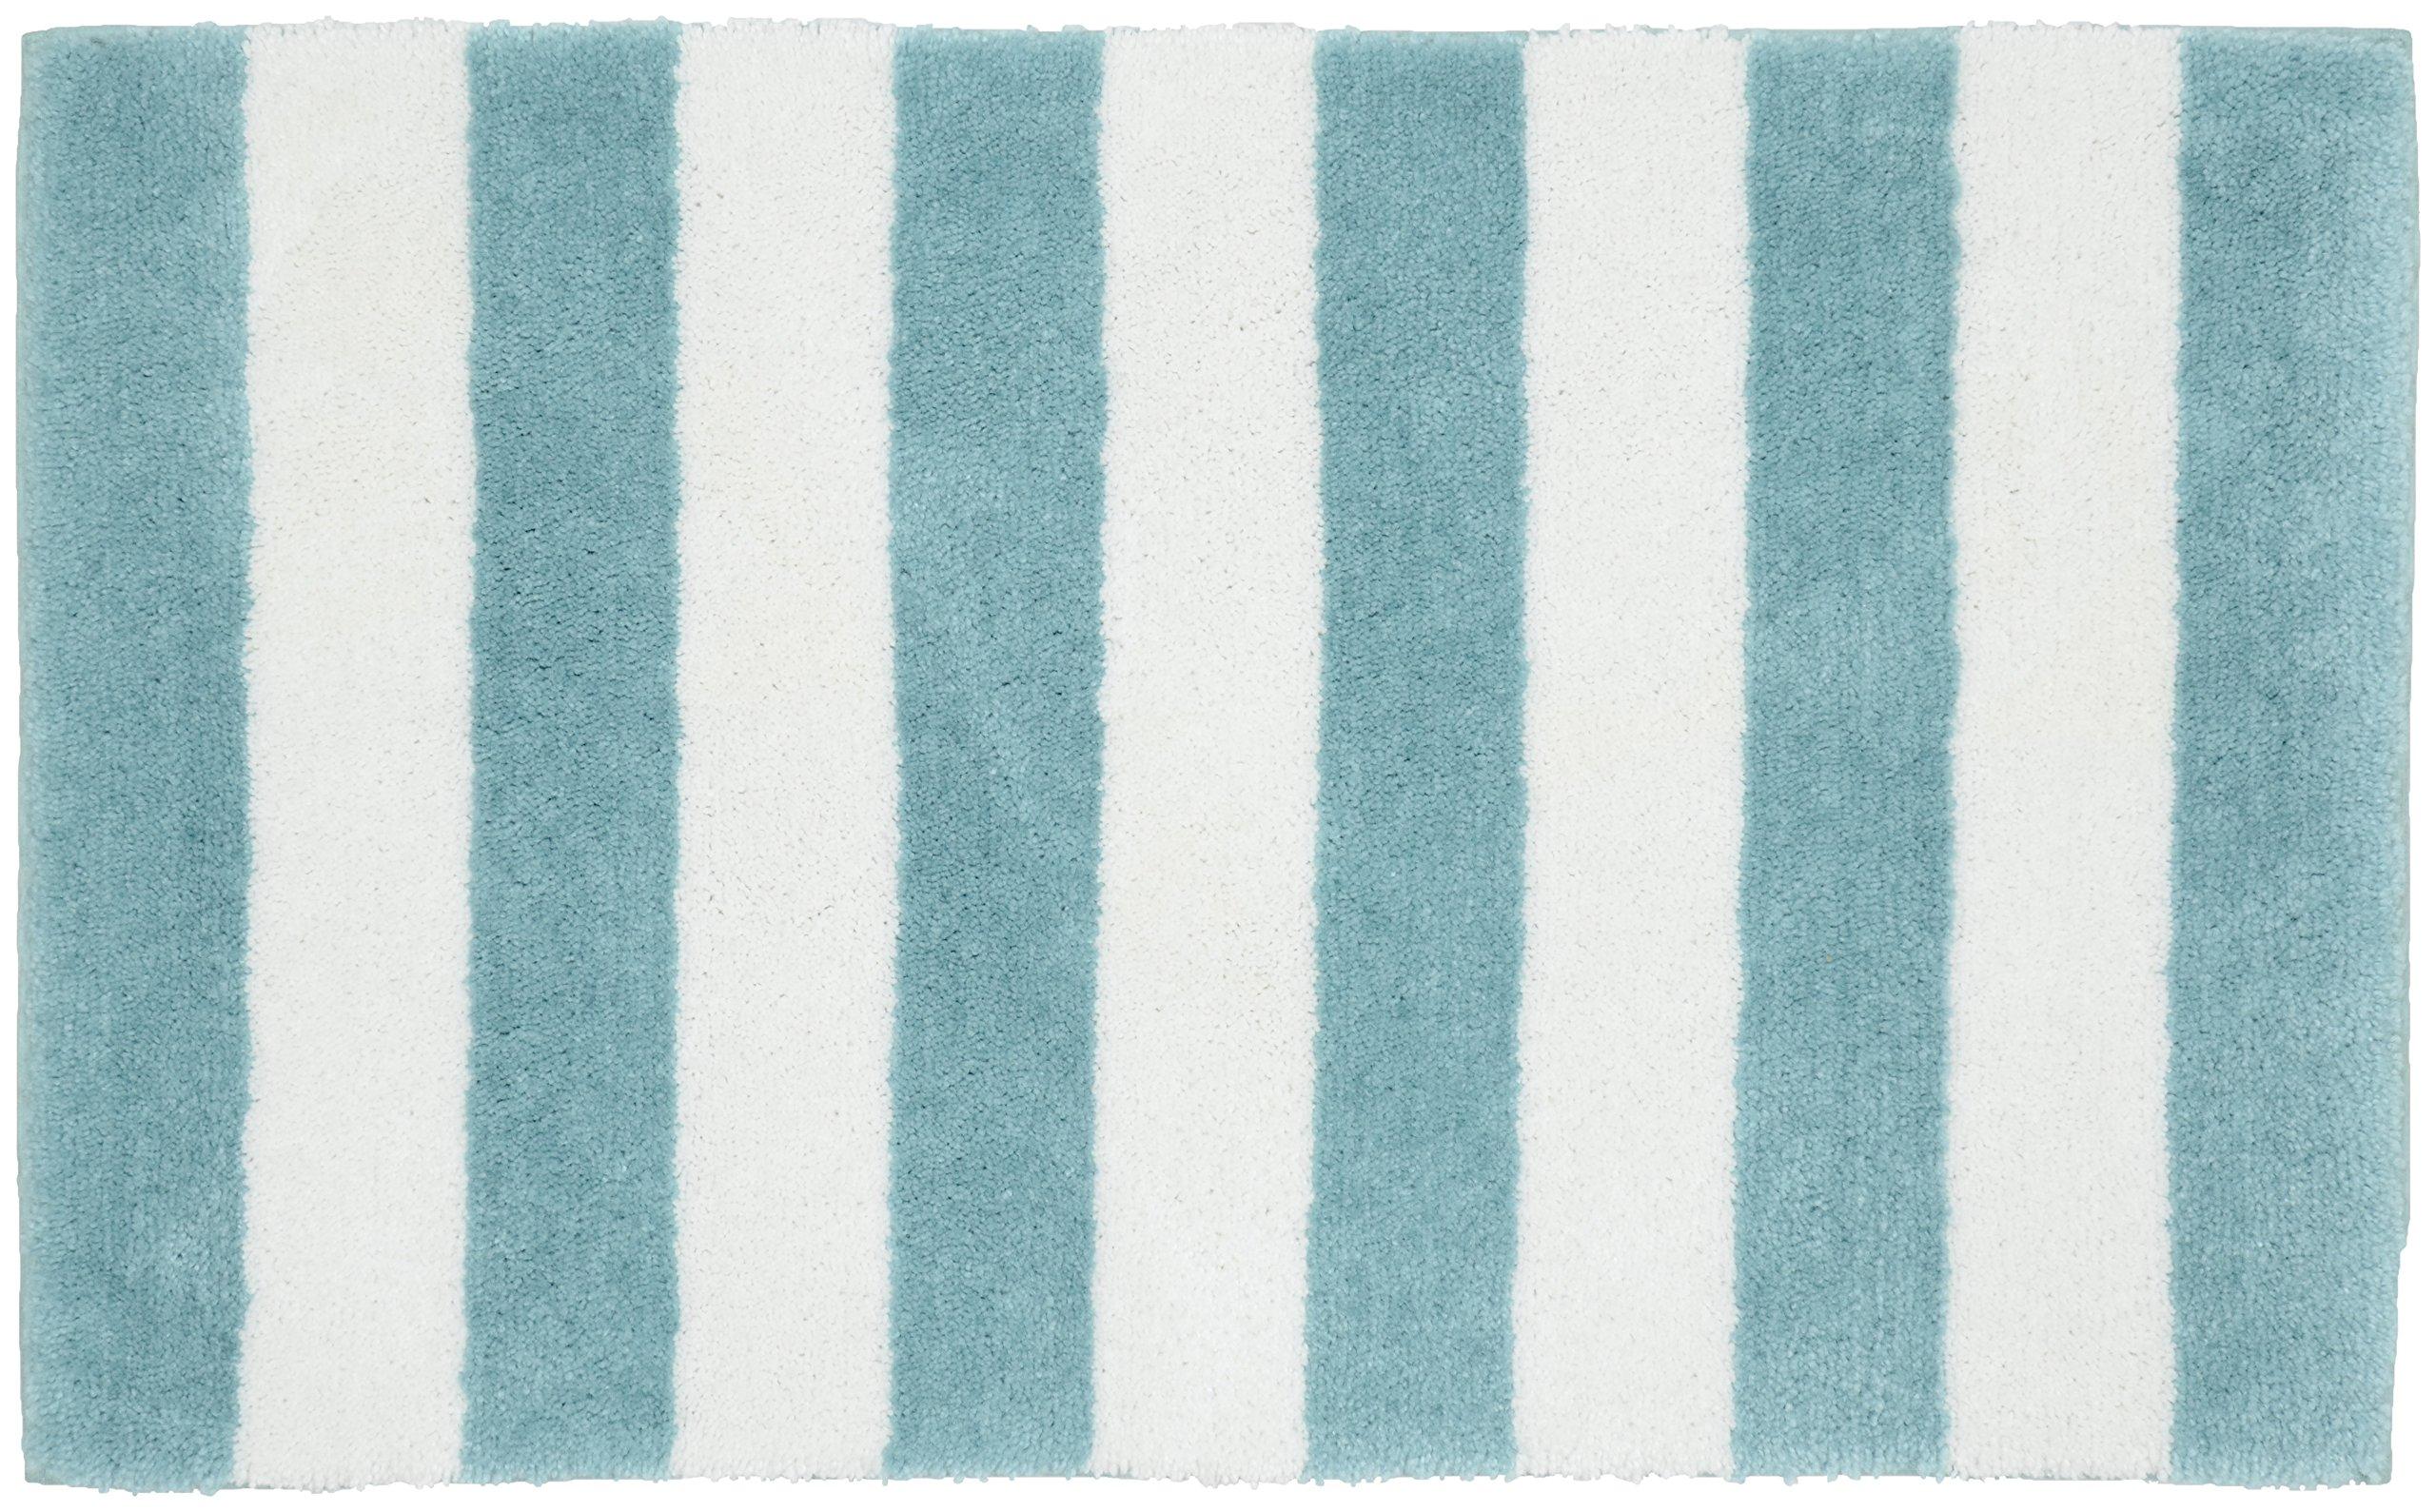 Garland Rug Beach Stripe Bath Rug, 21'' x 34'', Seafoam/White